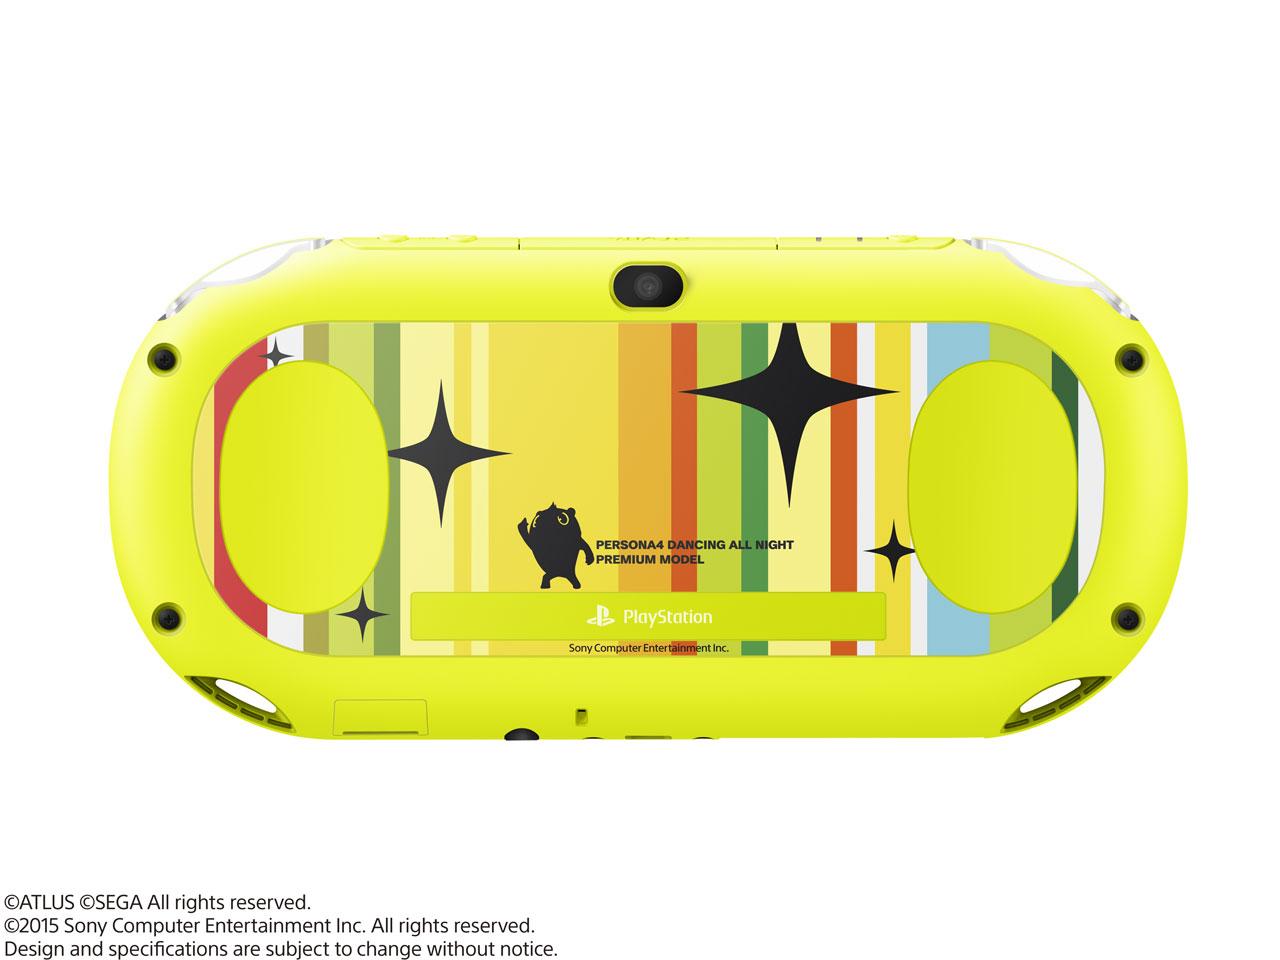 PlayStation Vita (プレイステーション ヴィータ) ペルソナ4 ダンシング・オールナイト プレミアム・クレイジーボックス PCHJ-10027